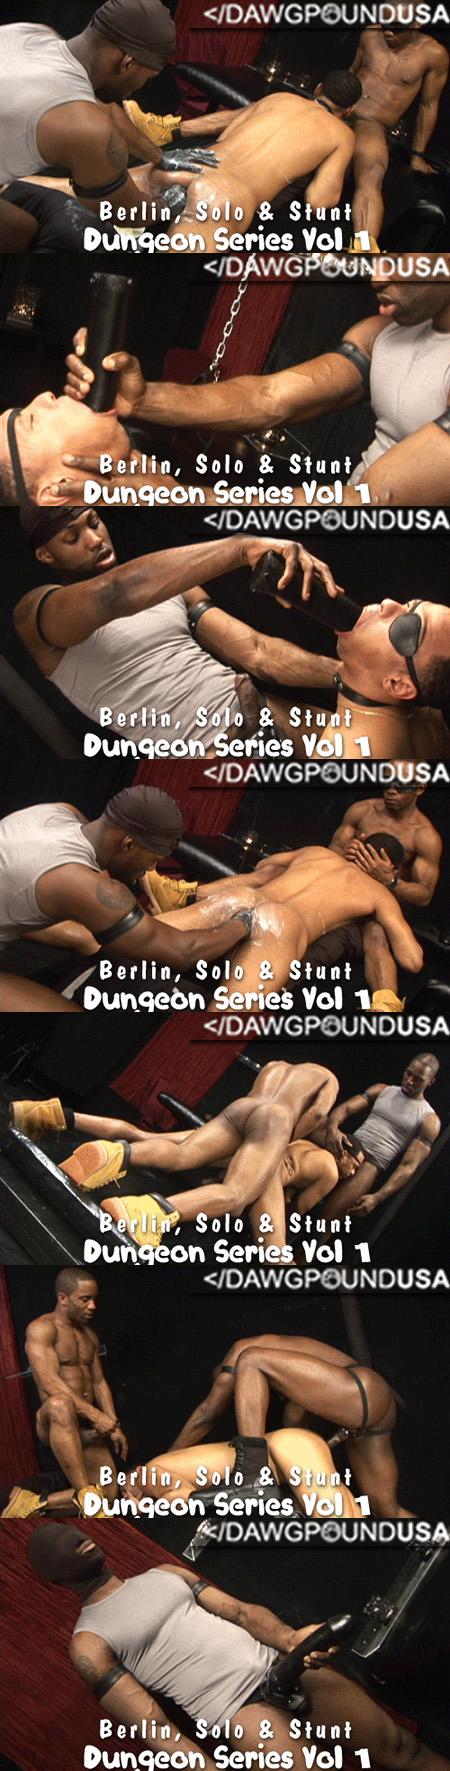 Dawgpoundusa.com - Dungeon